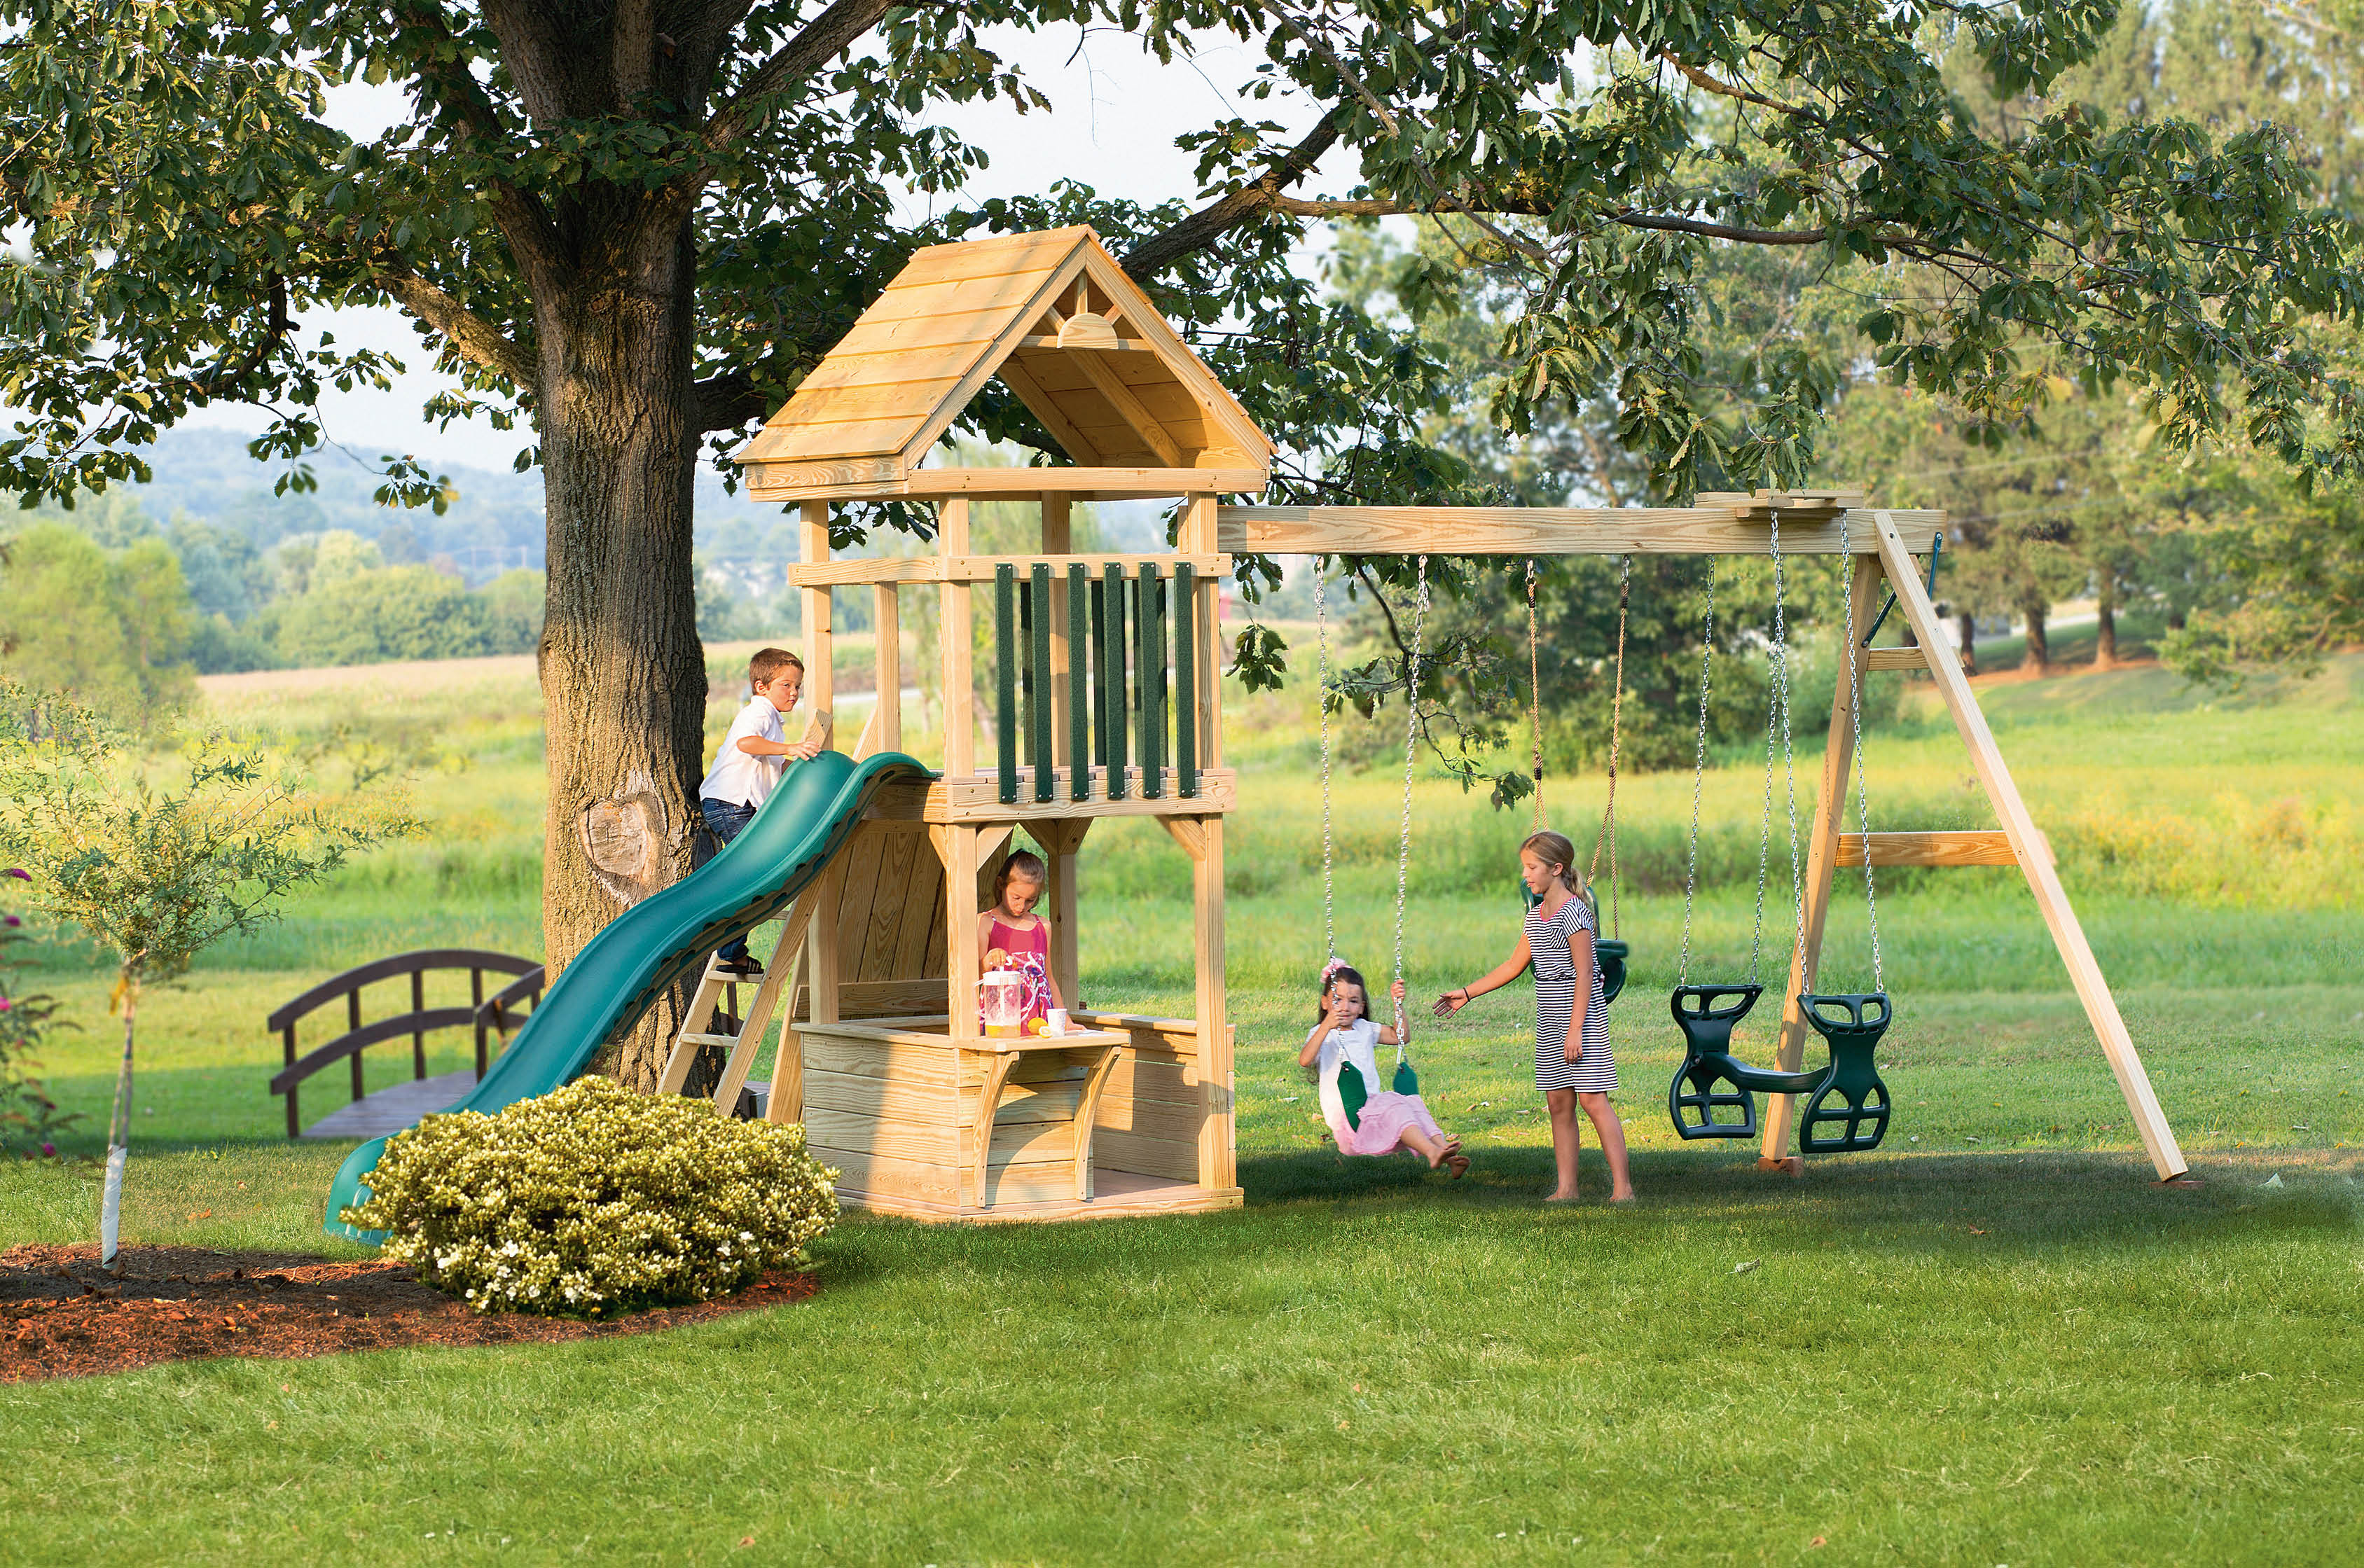 slides,sandbox,jungle gym,gazebo,tables,chairs,rent,discount,deal,Nancy J's,toughkenamon PA,playground equipment,playground,kids,